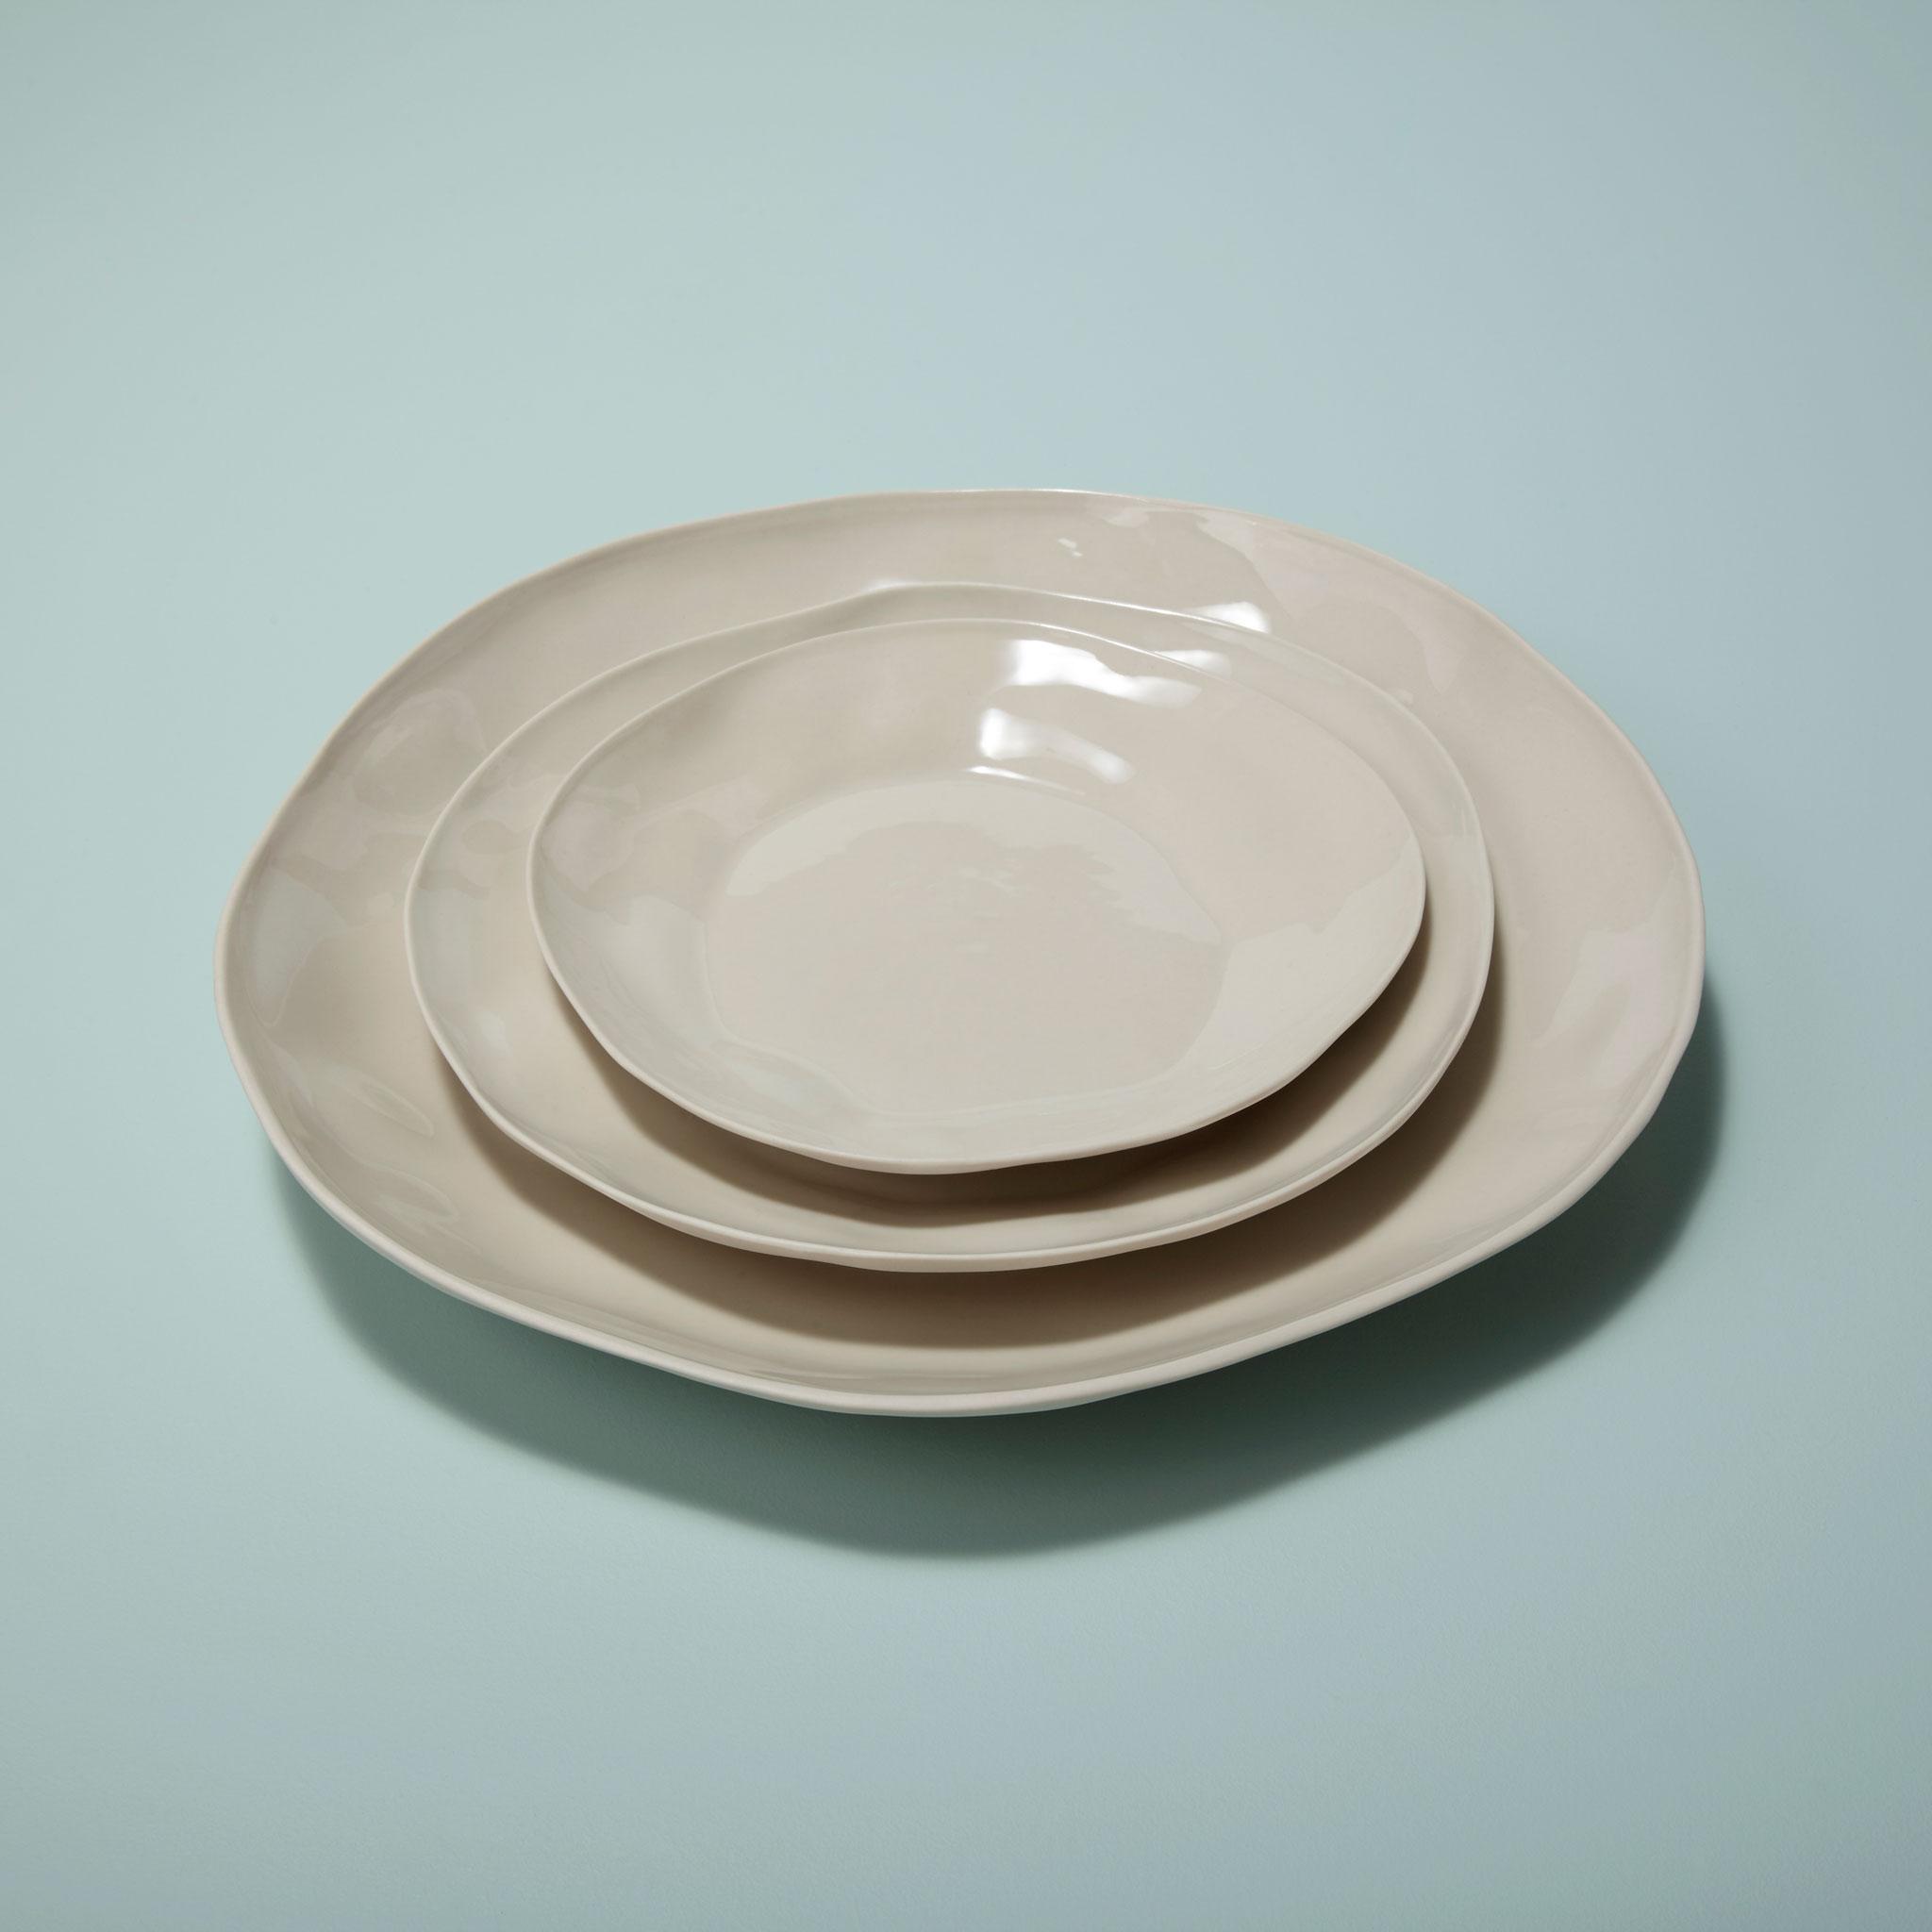 Stoneware Platter White 6